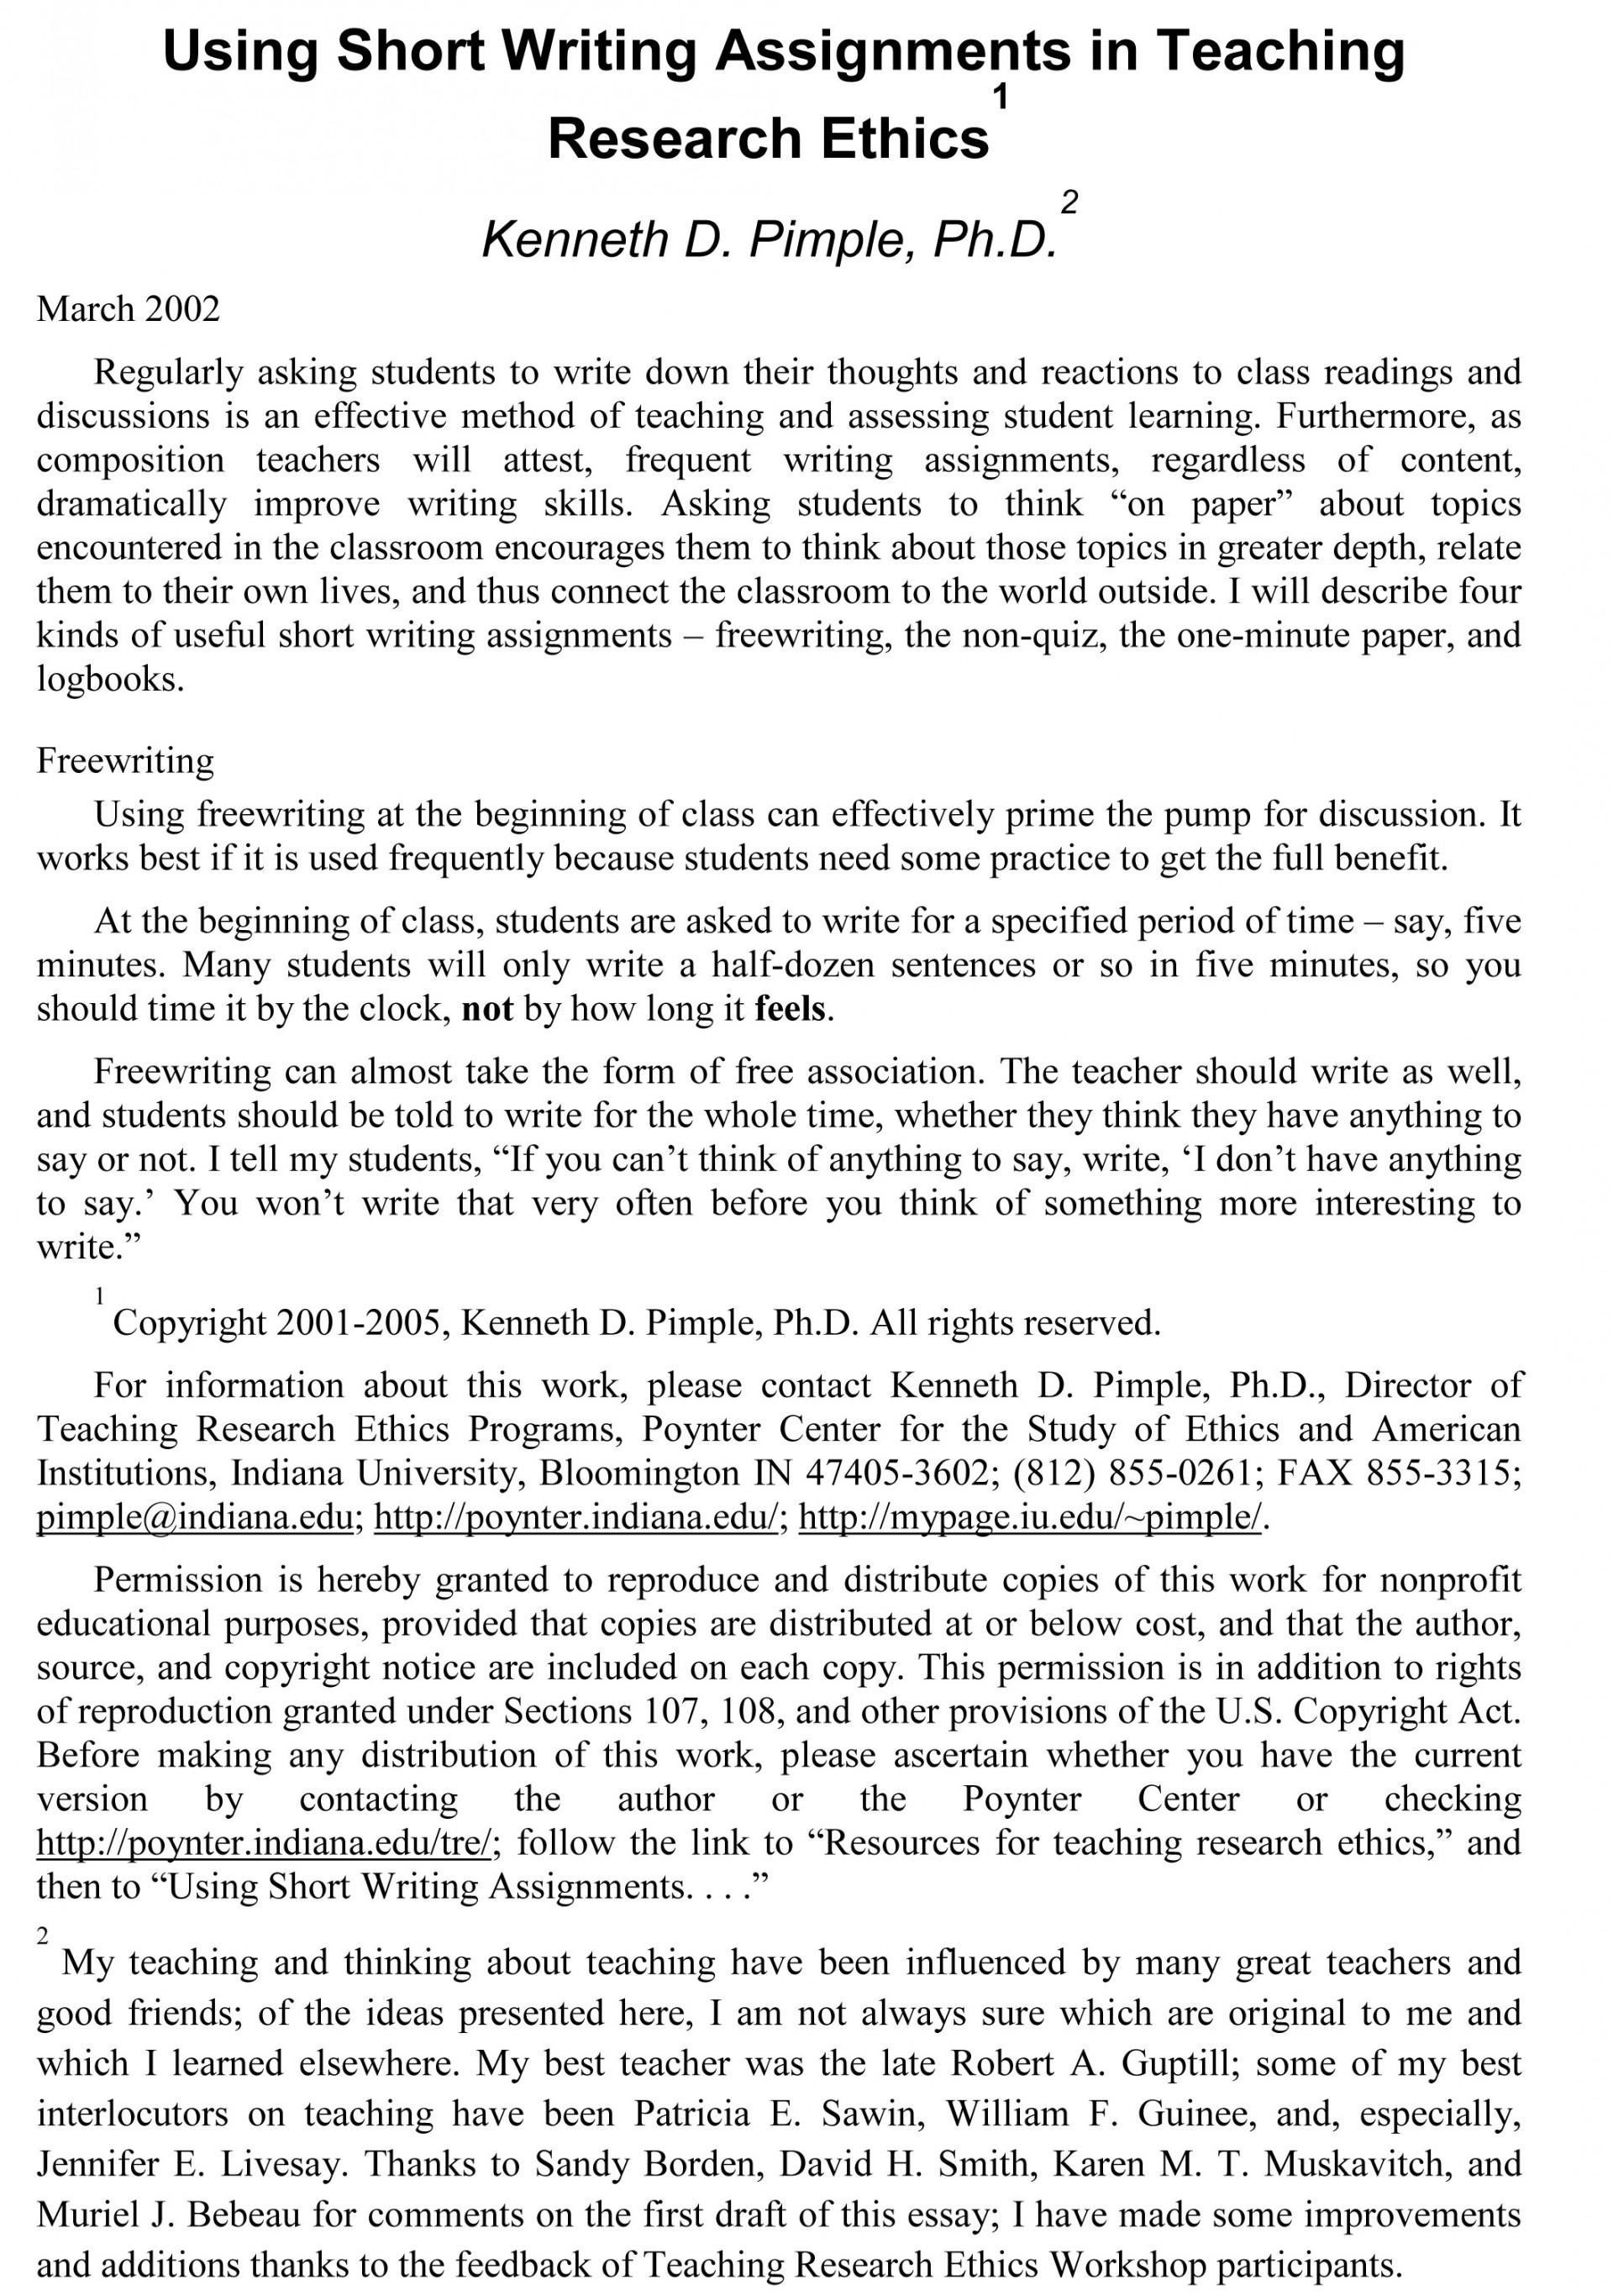 015 Essay Example Sample Teaching Evaluation Shocking Argument 1920